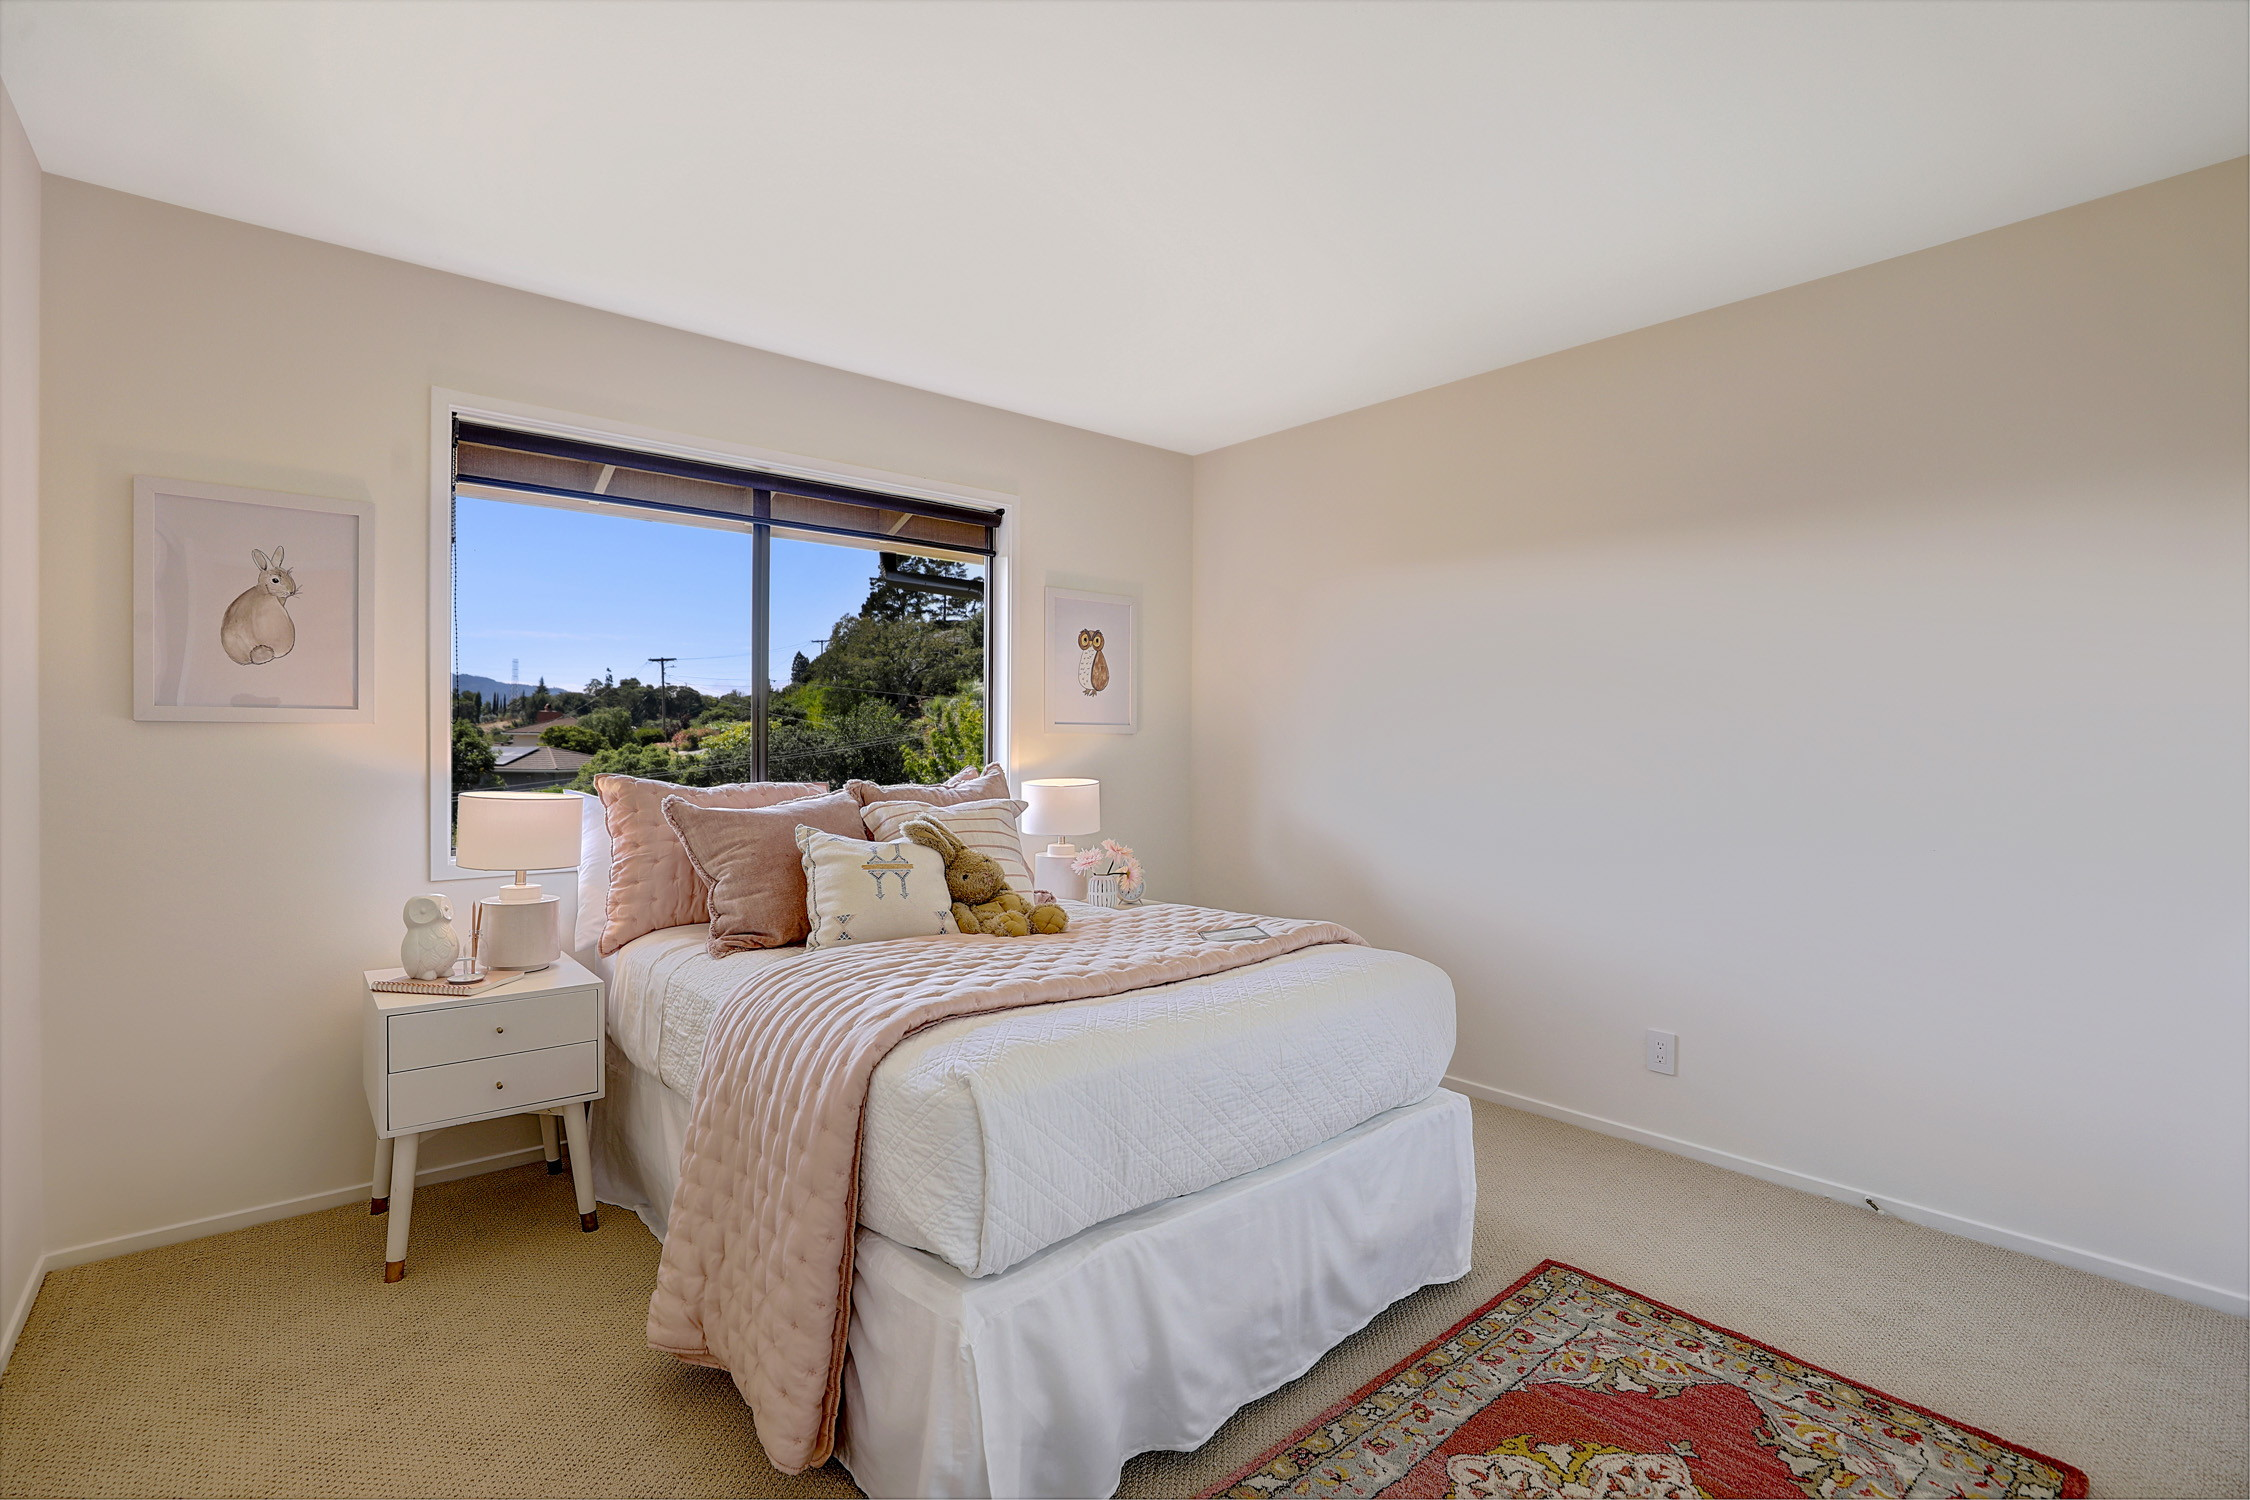 16Dorian 48 MLSSan Rafael Real Estate - Listed by Julia Fitzpatrick + Allie Fornesi Team Own Marin County .jpg